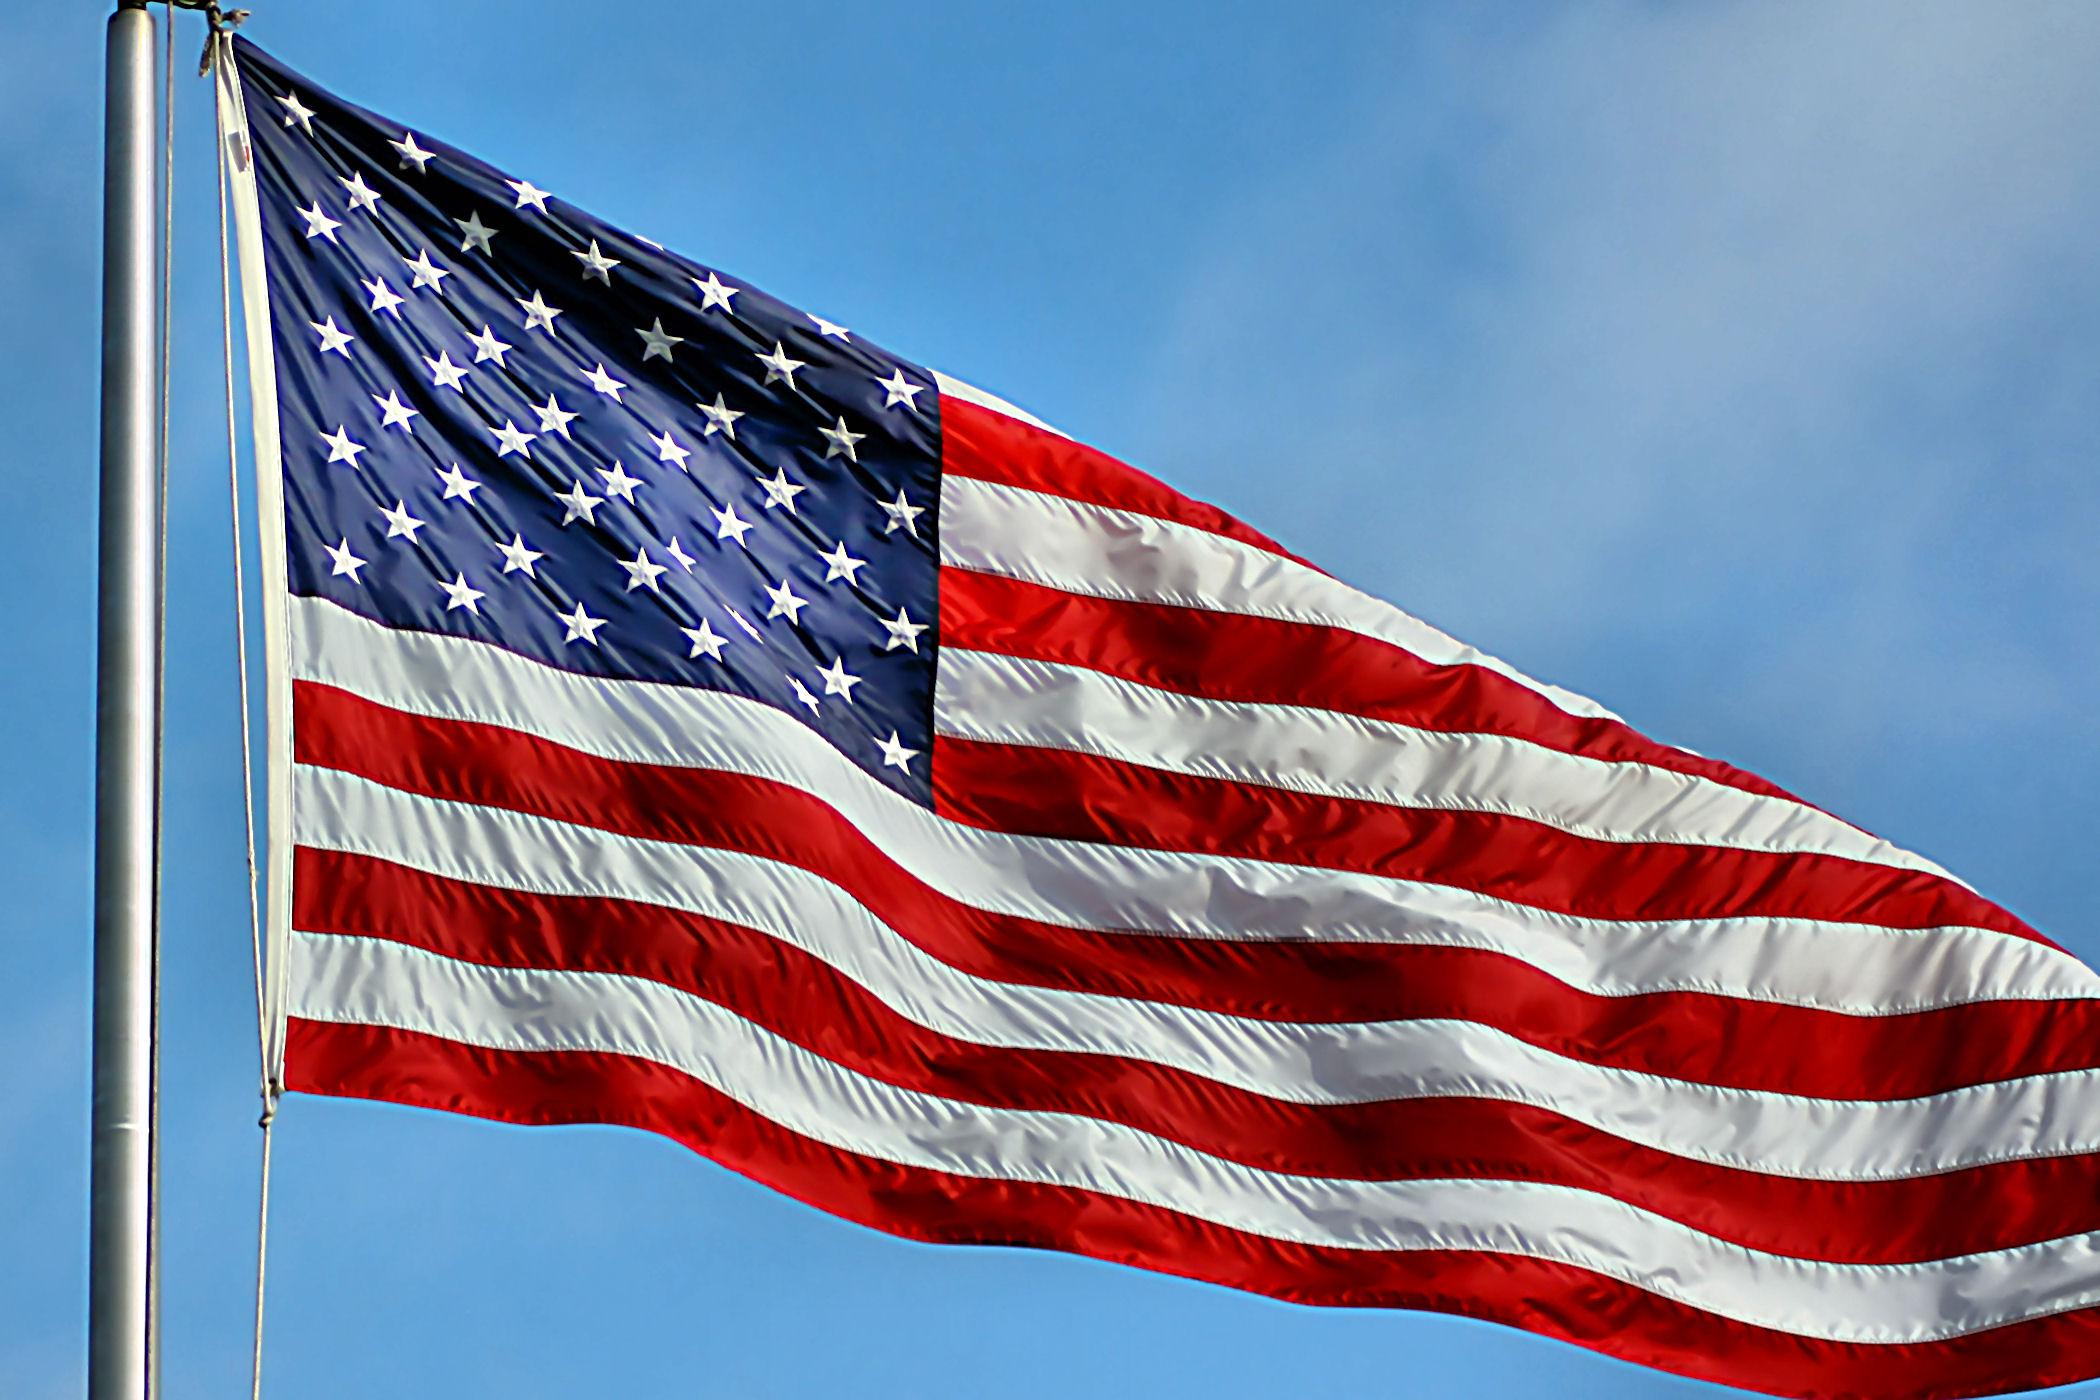 بالصور صور علم امريكا , اجمل صور لعلم امريكا 980